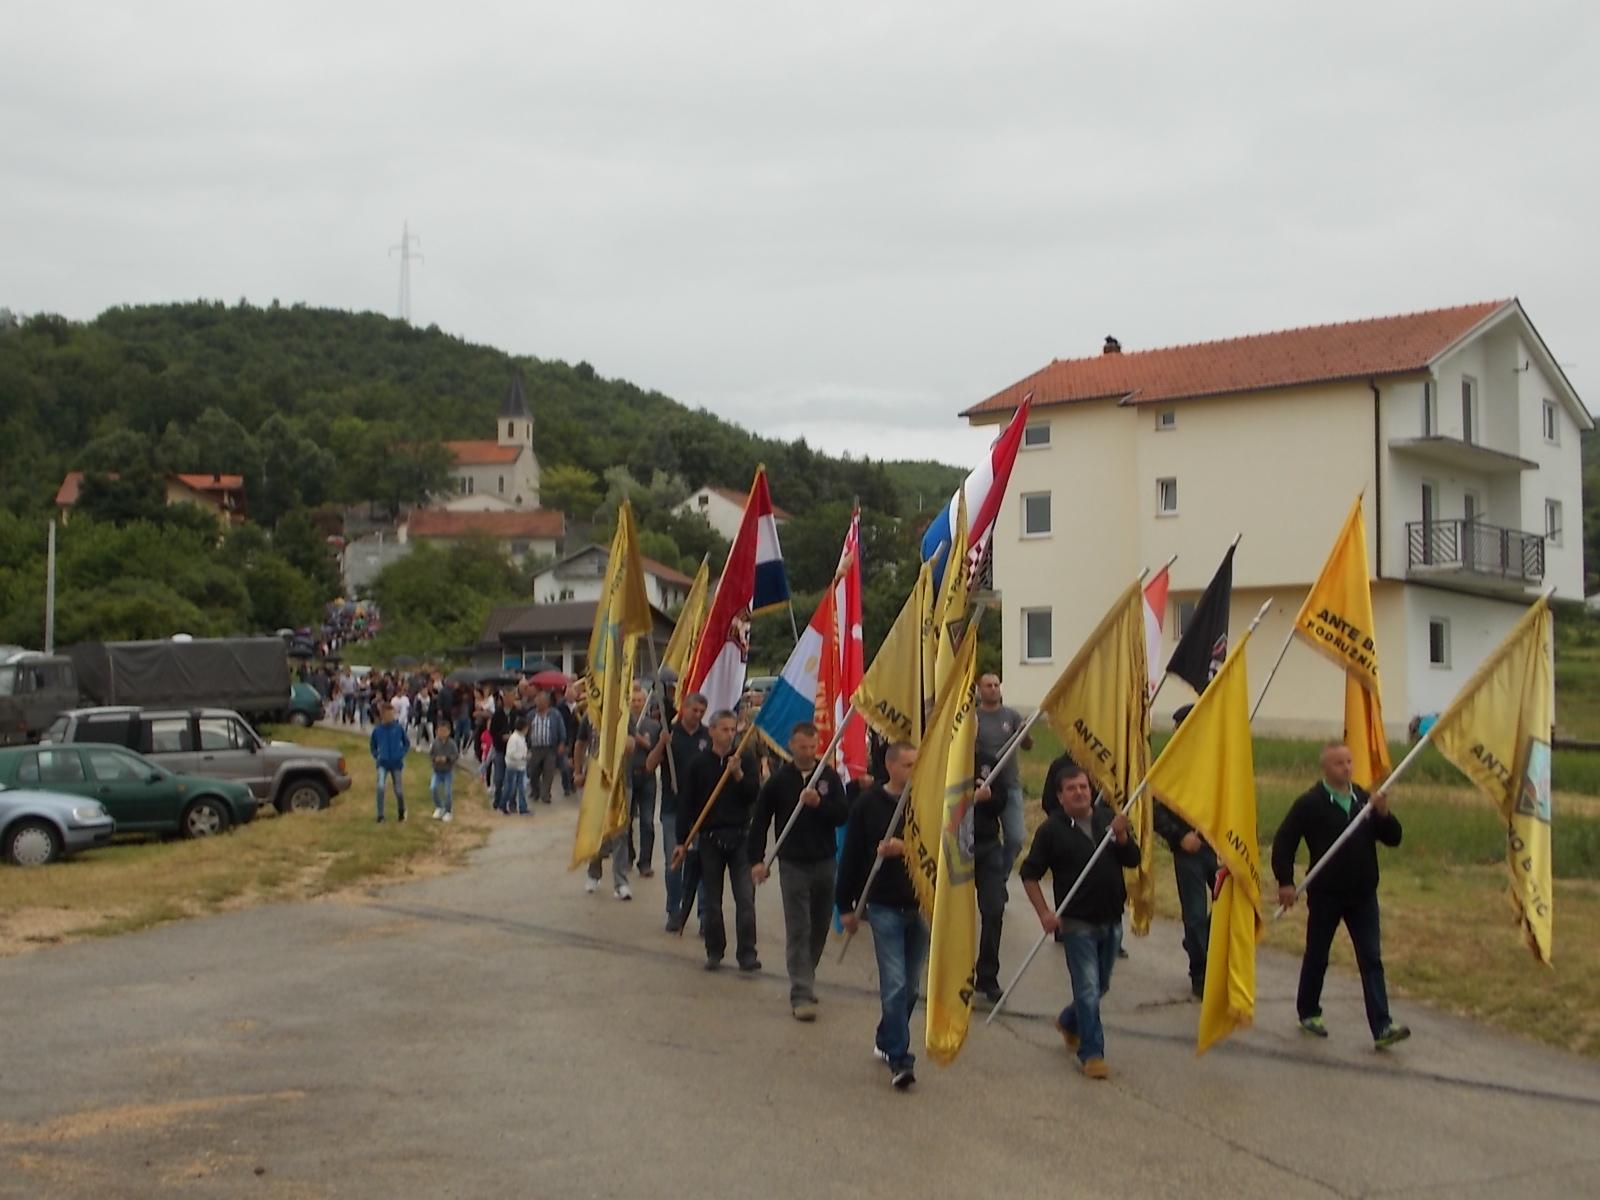 Obilježena 24. obljetnica Prve gardijske brigade A.B. Bušić